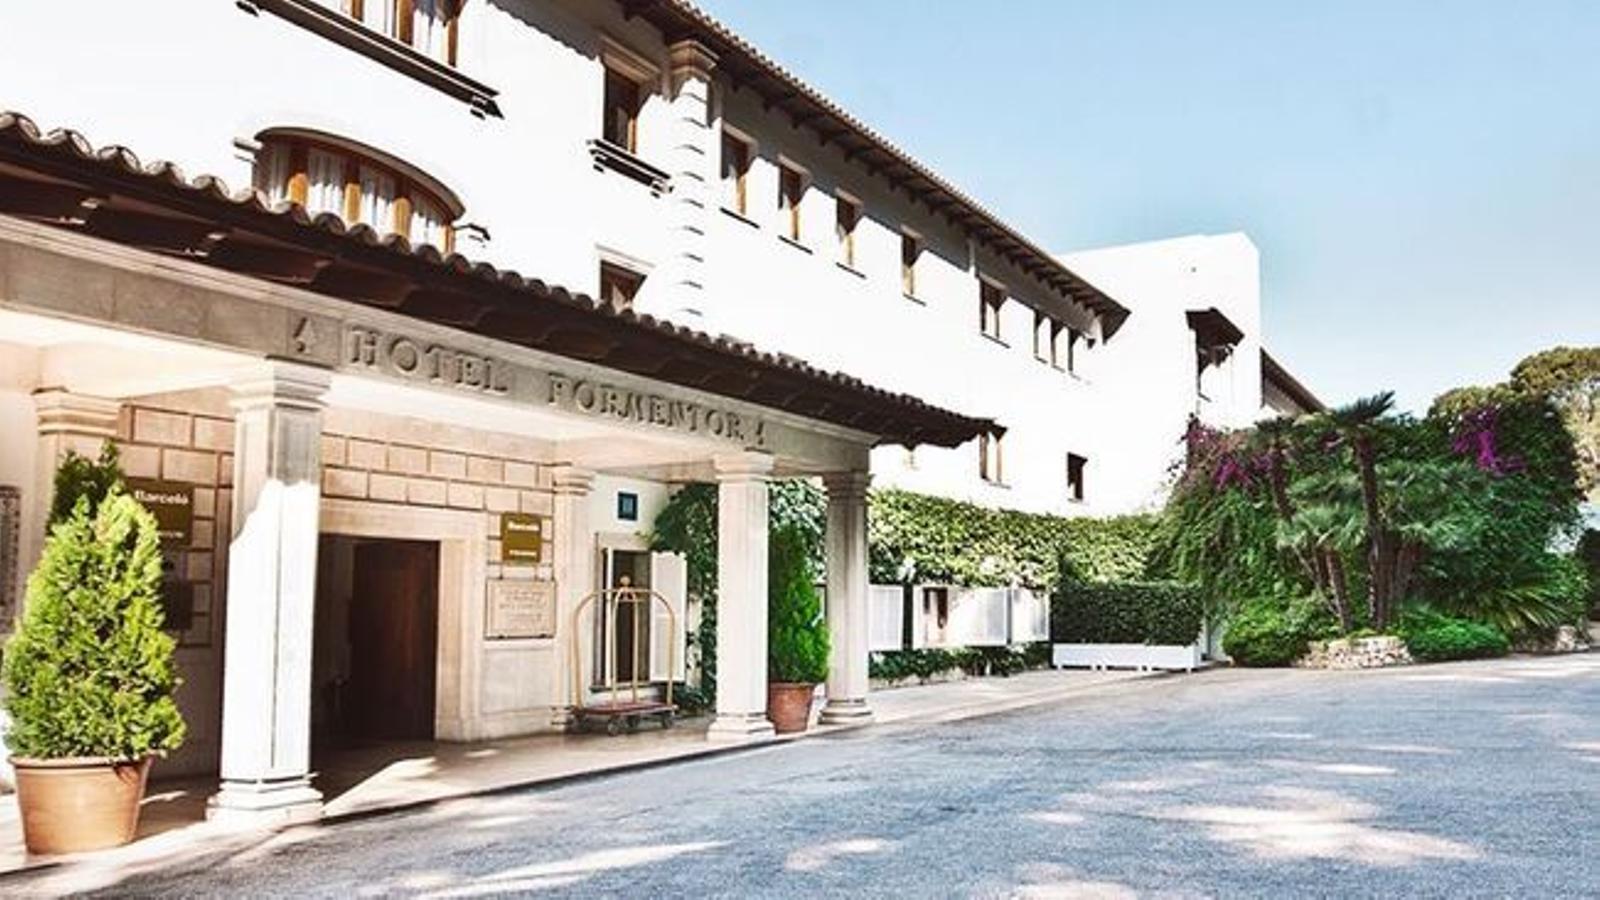 L'Hotel Formentor.